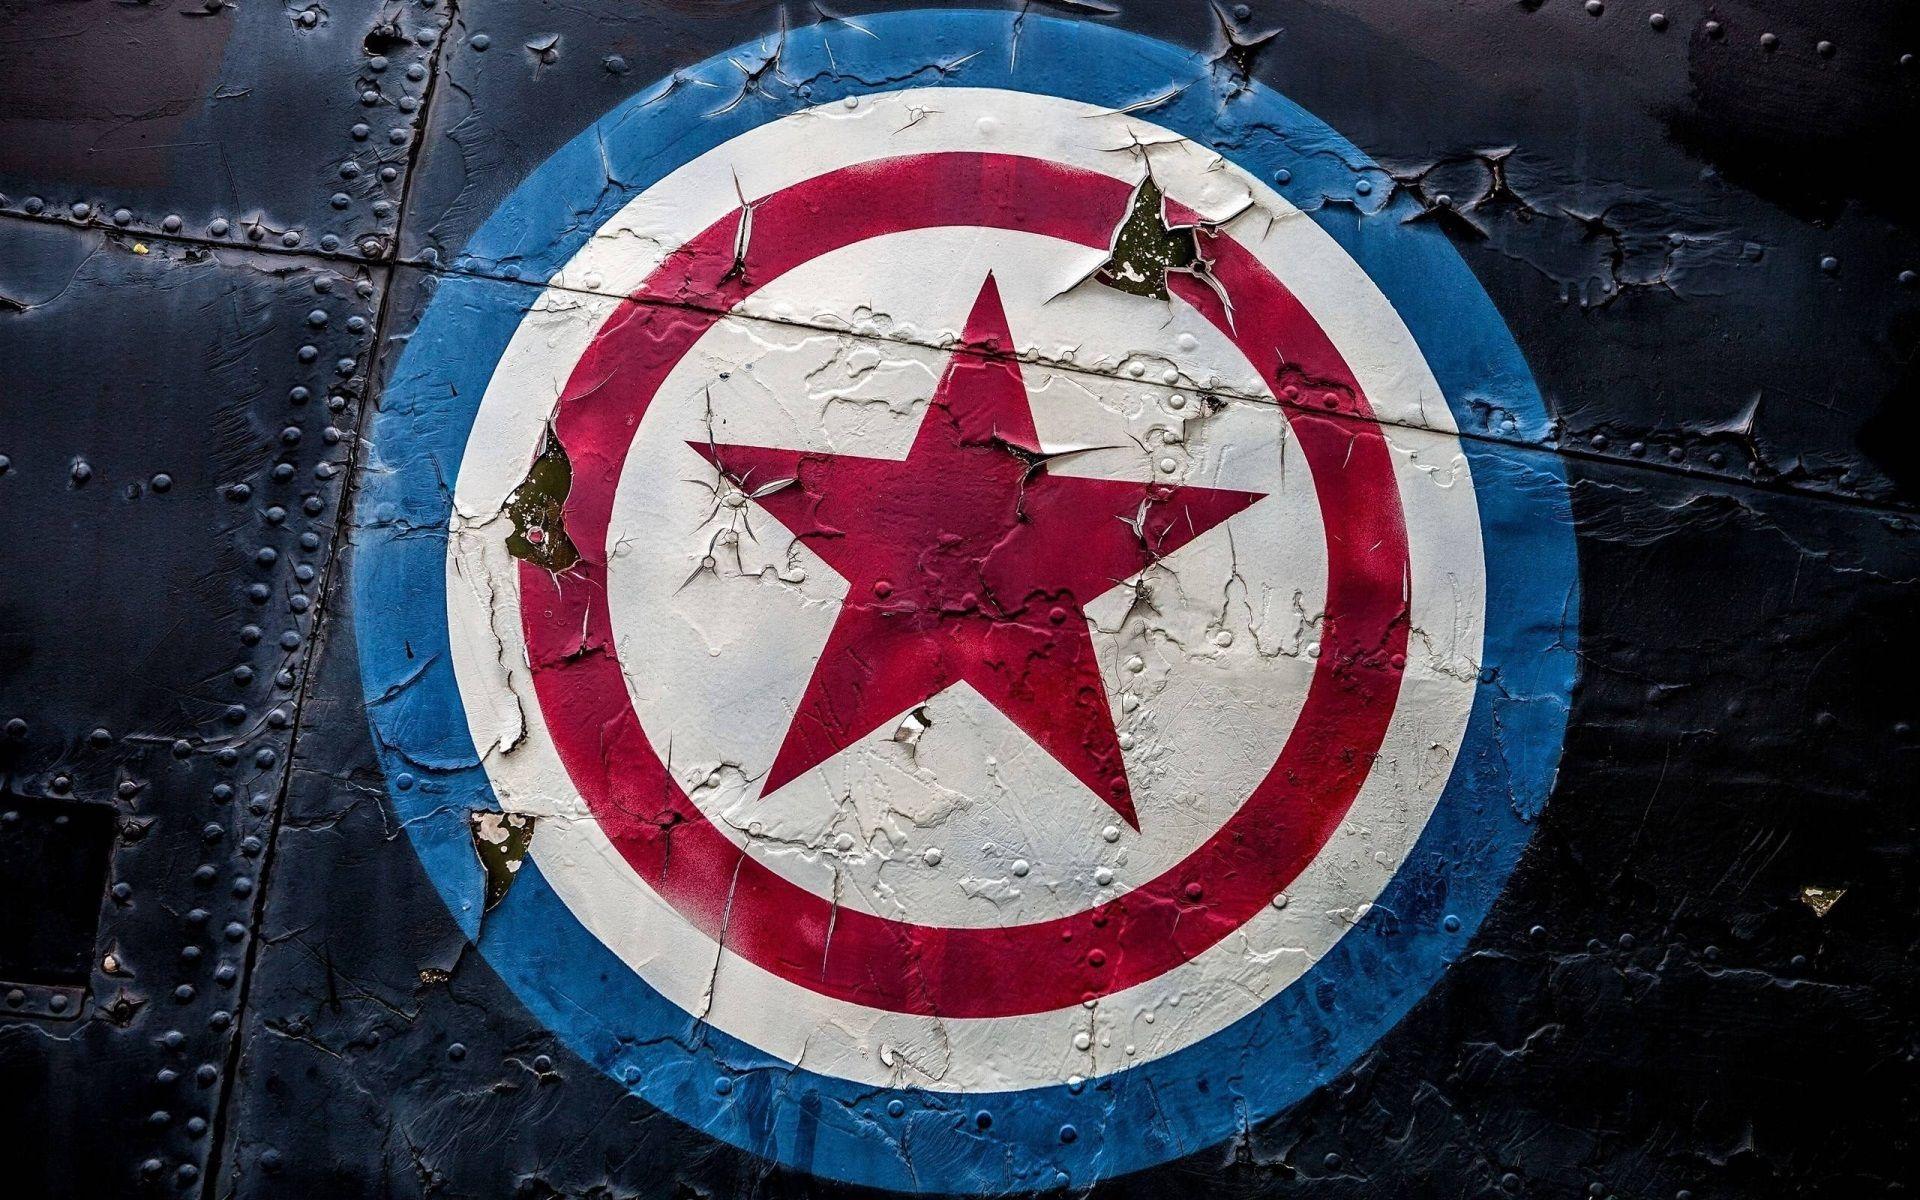 1920x1200 captain america civil war full hd dibujo pinterest 1920x1200 captain america civil war full hd toneelgroepblik Image collections